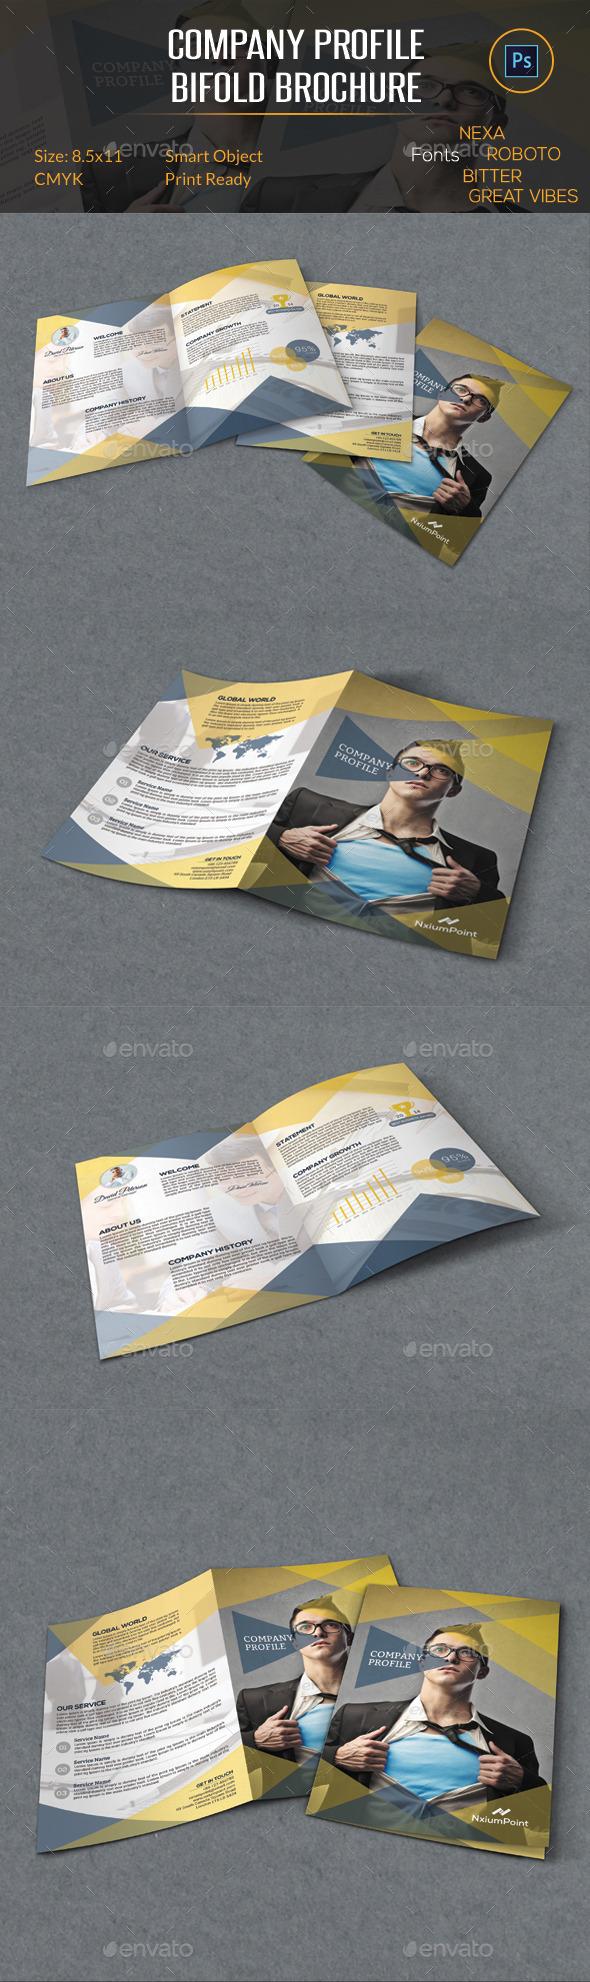 Company Profile Bifold Brochure - Corporate Brochures